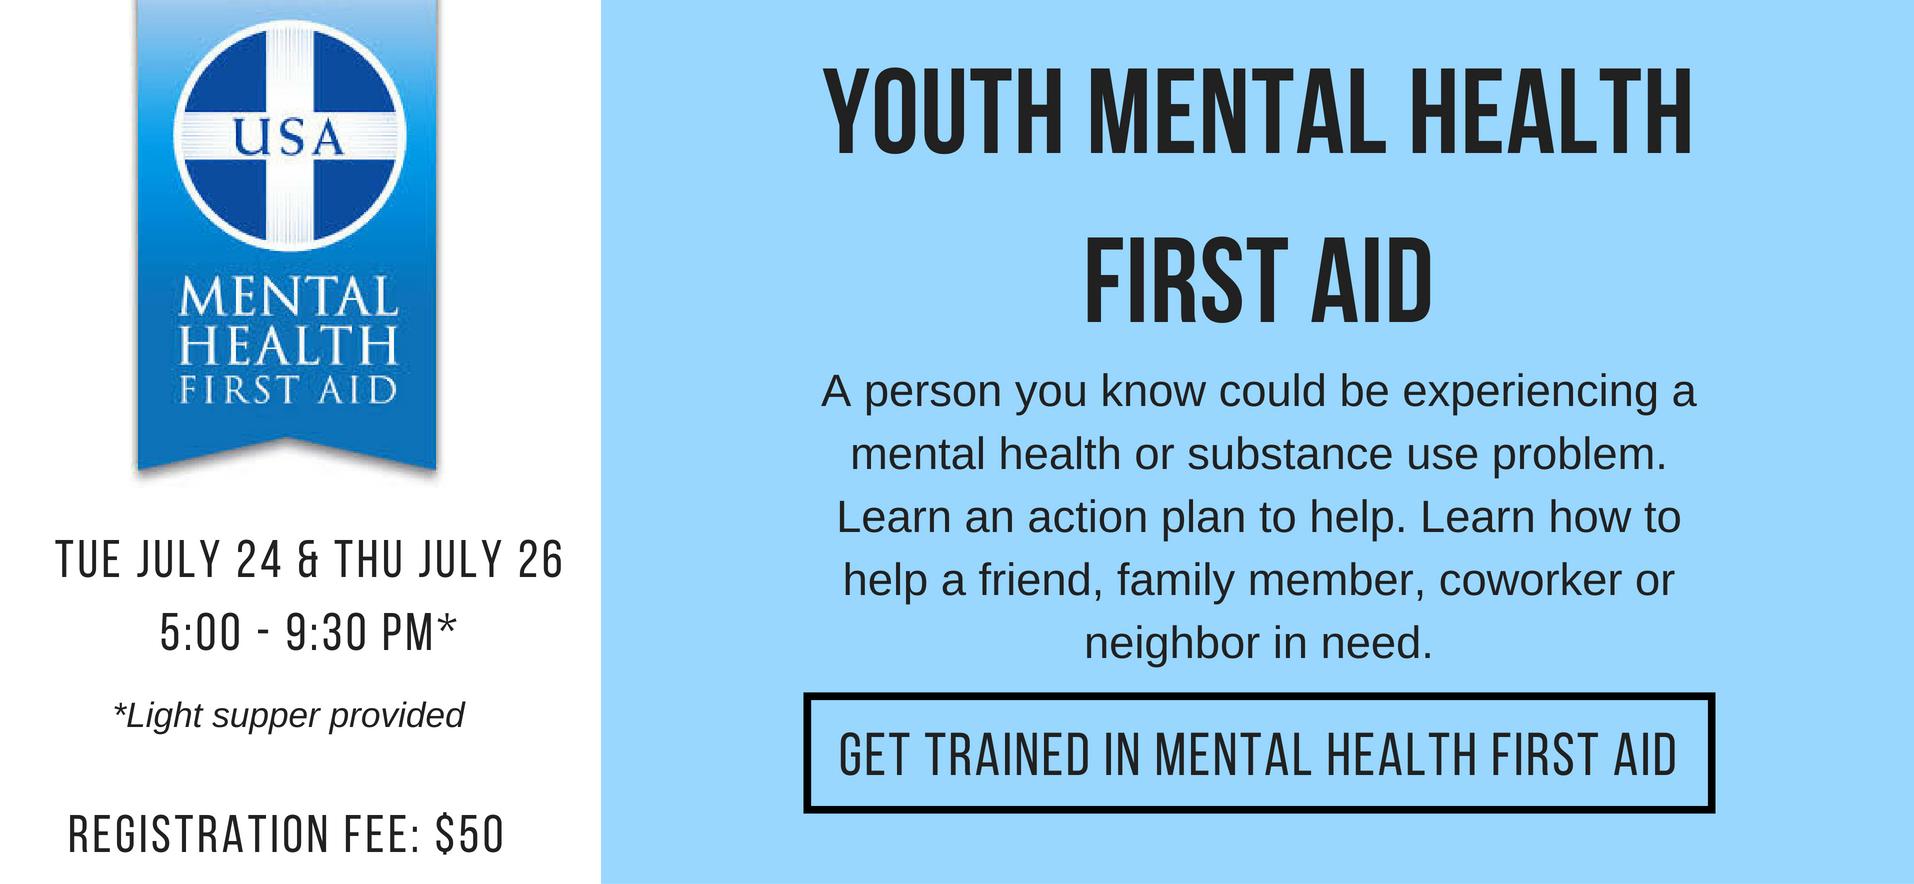 Youth Mental Health First Aid-WebPage Short.jpg